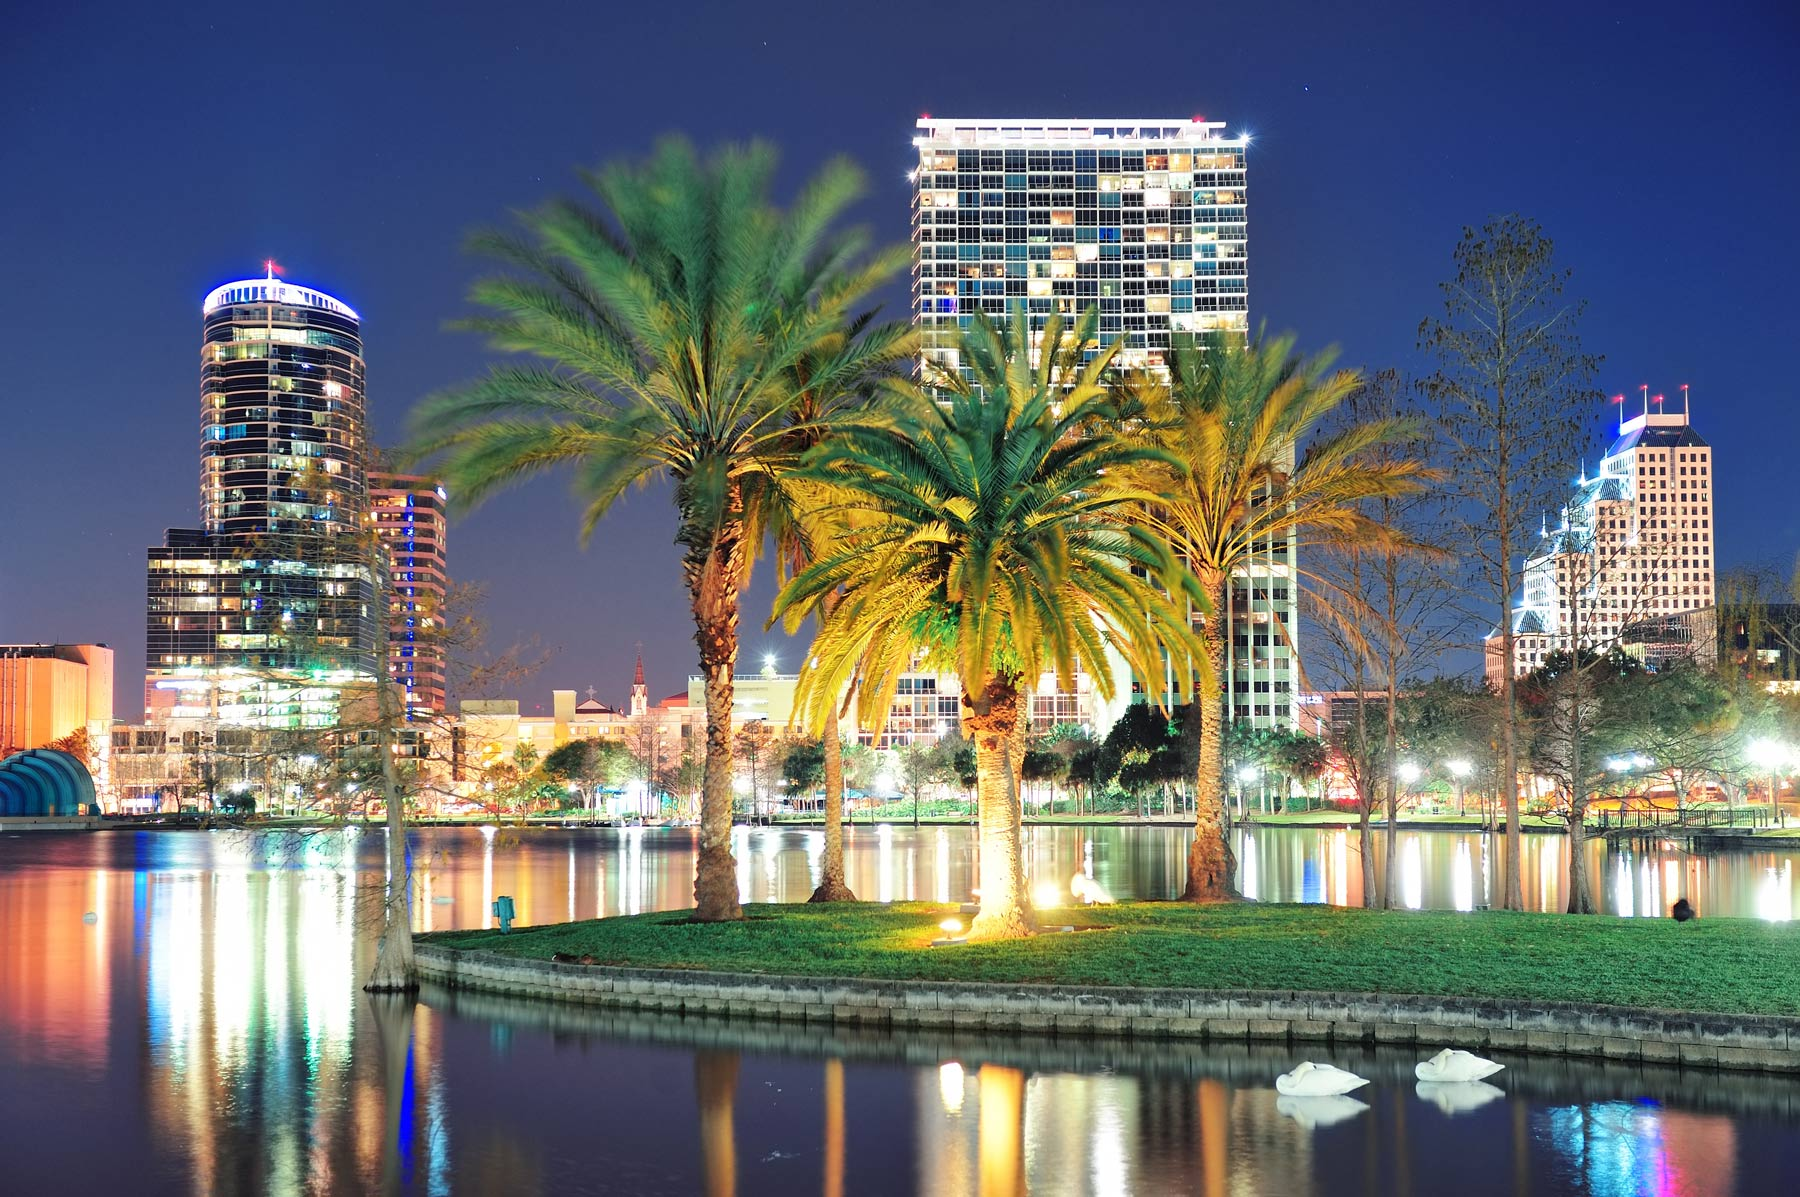 Orlando skyline at night with palm trees